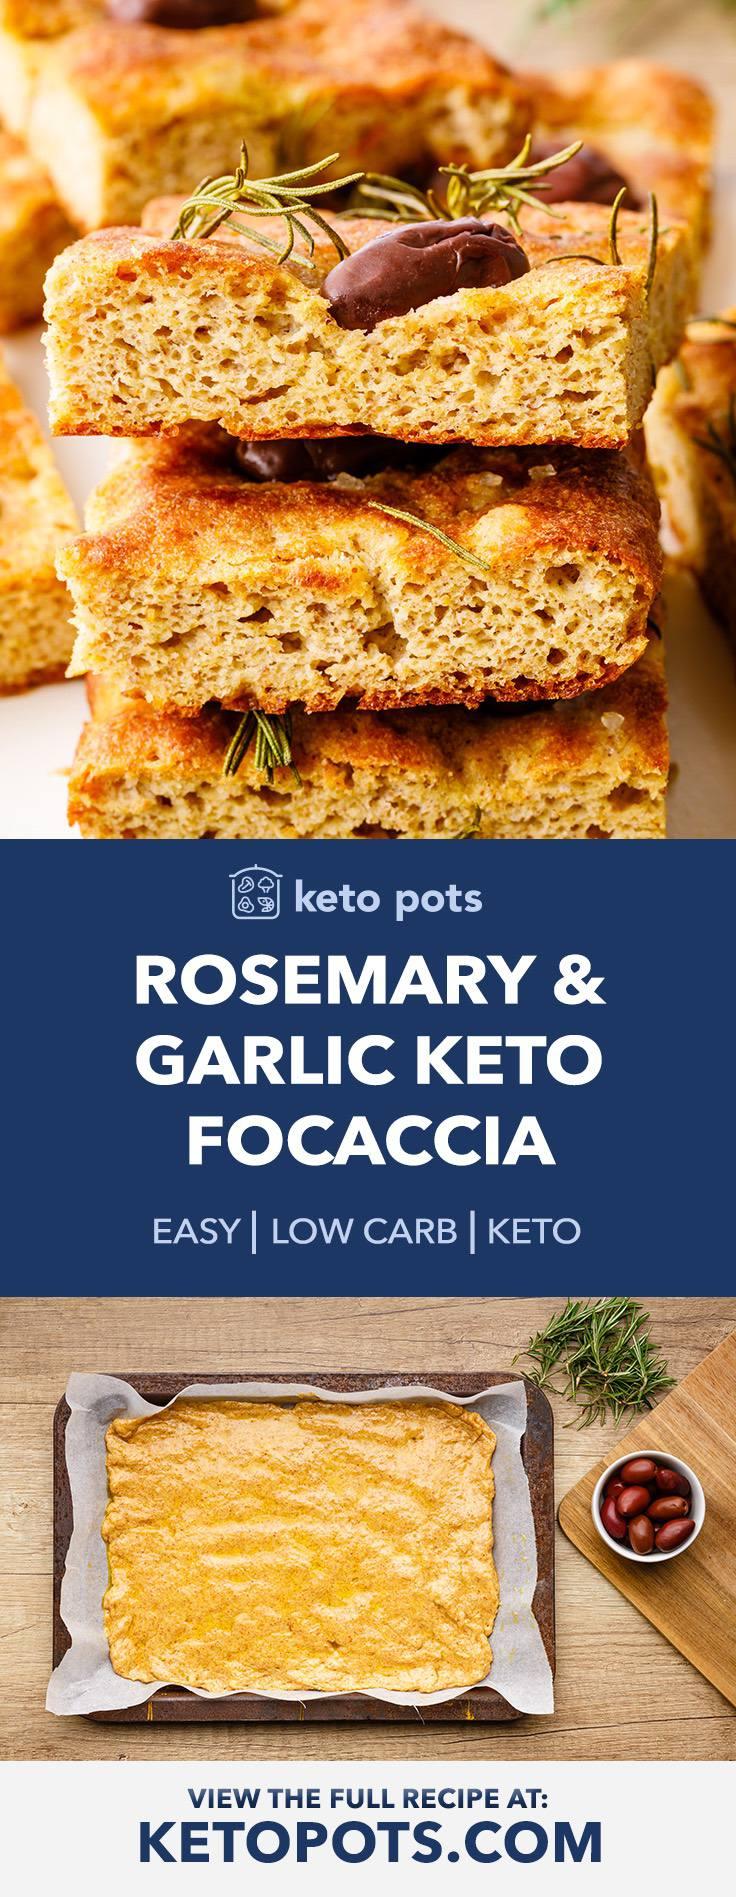 Rosemary and Garlic Keto Focaccia Bread